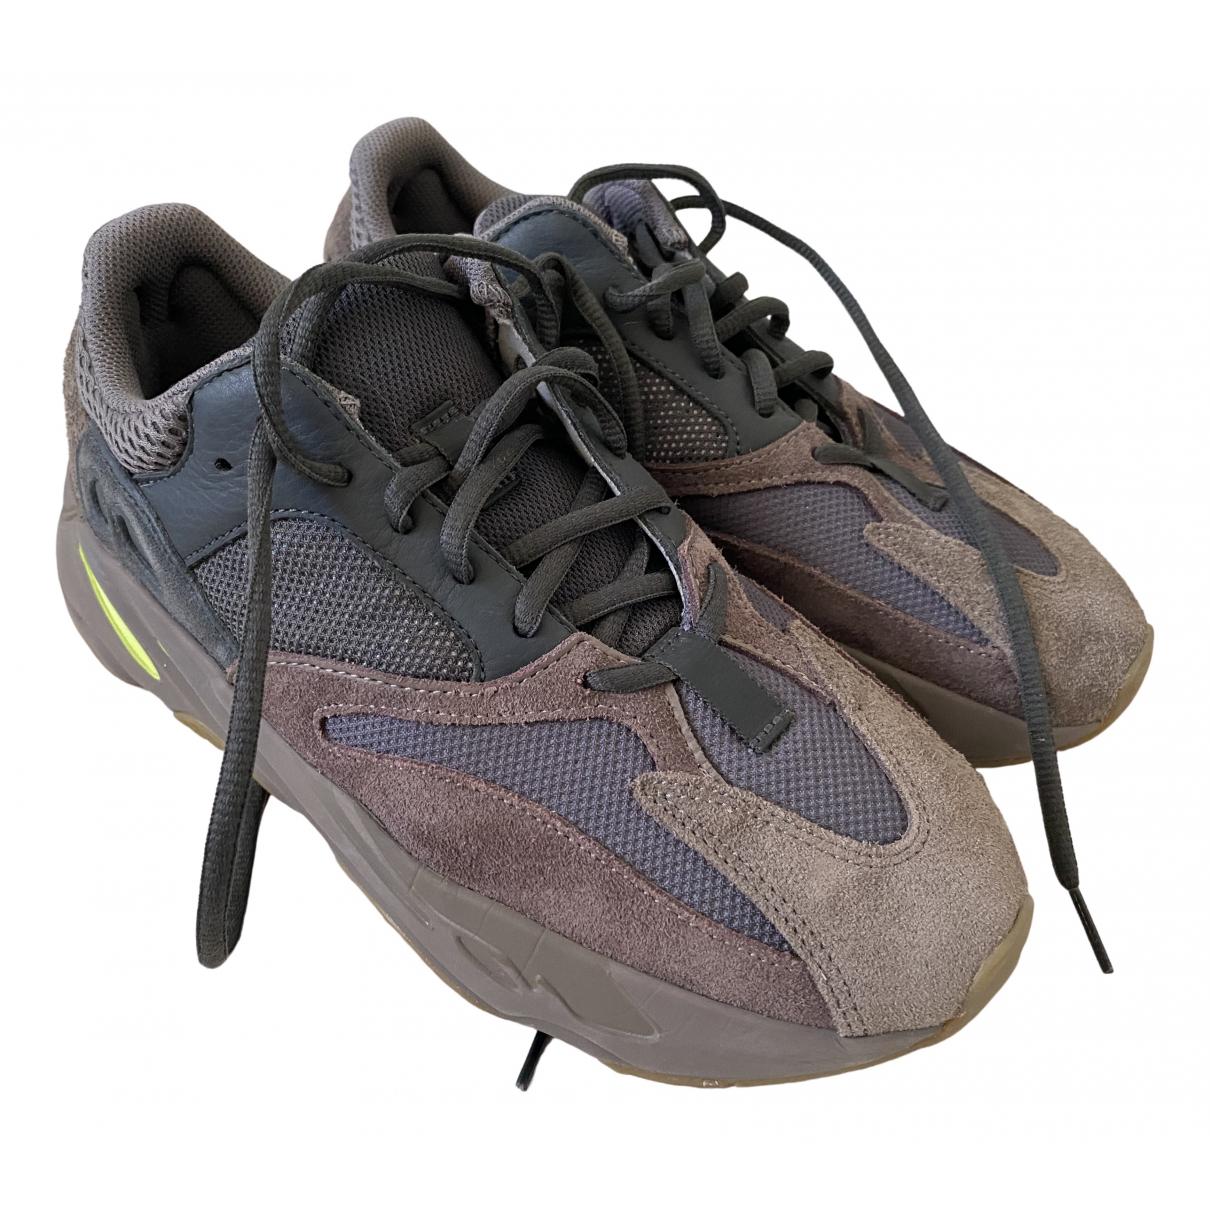 Yeezy X Adidas - Baskets 500 pour homme en toile - marron